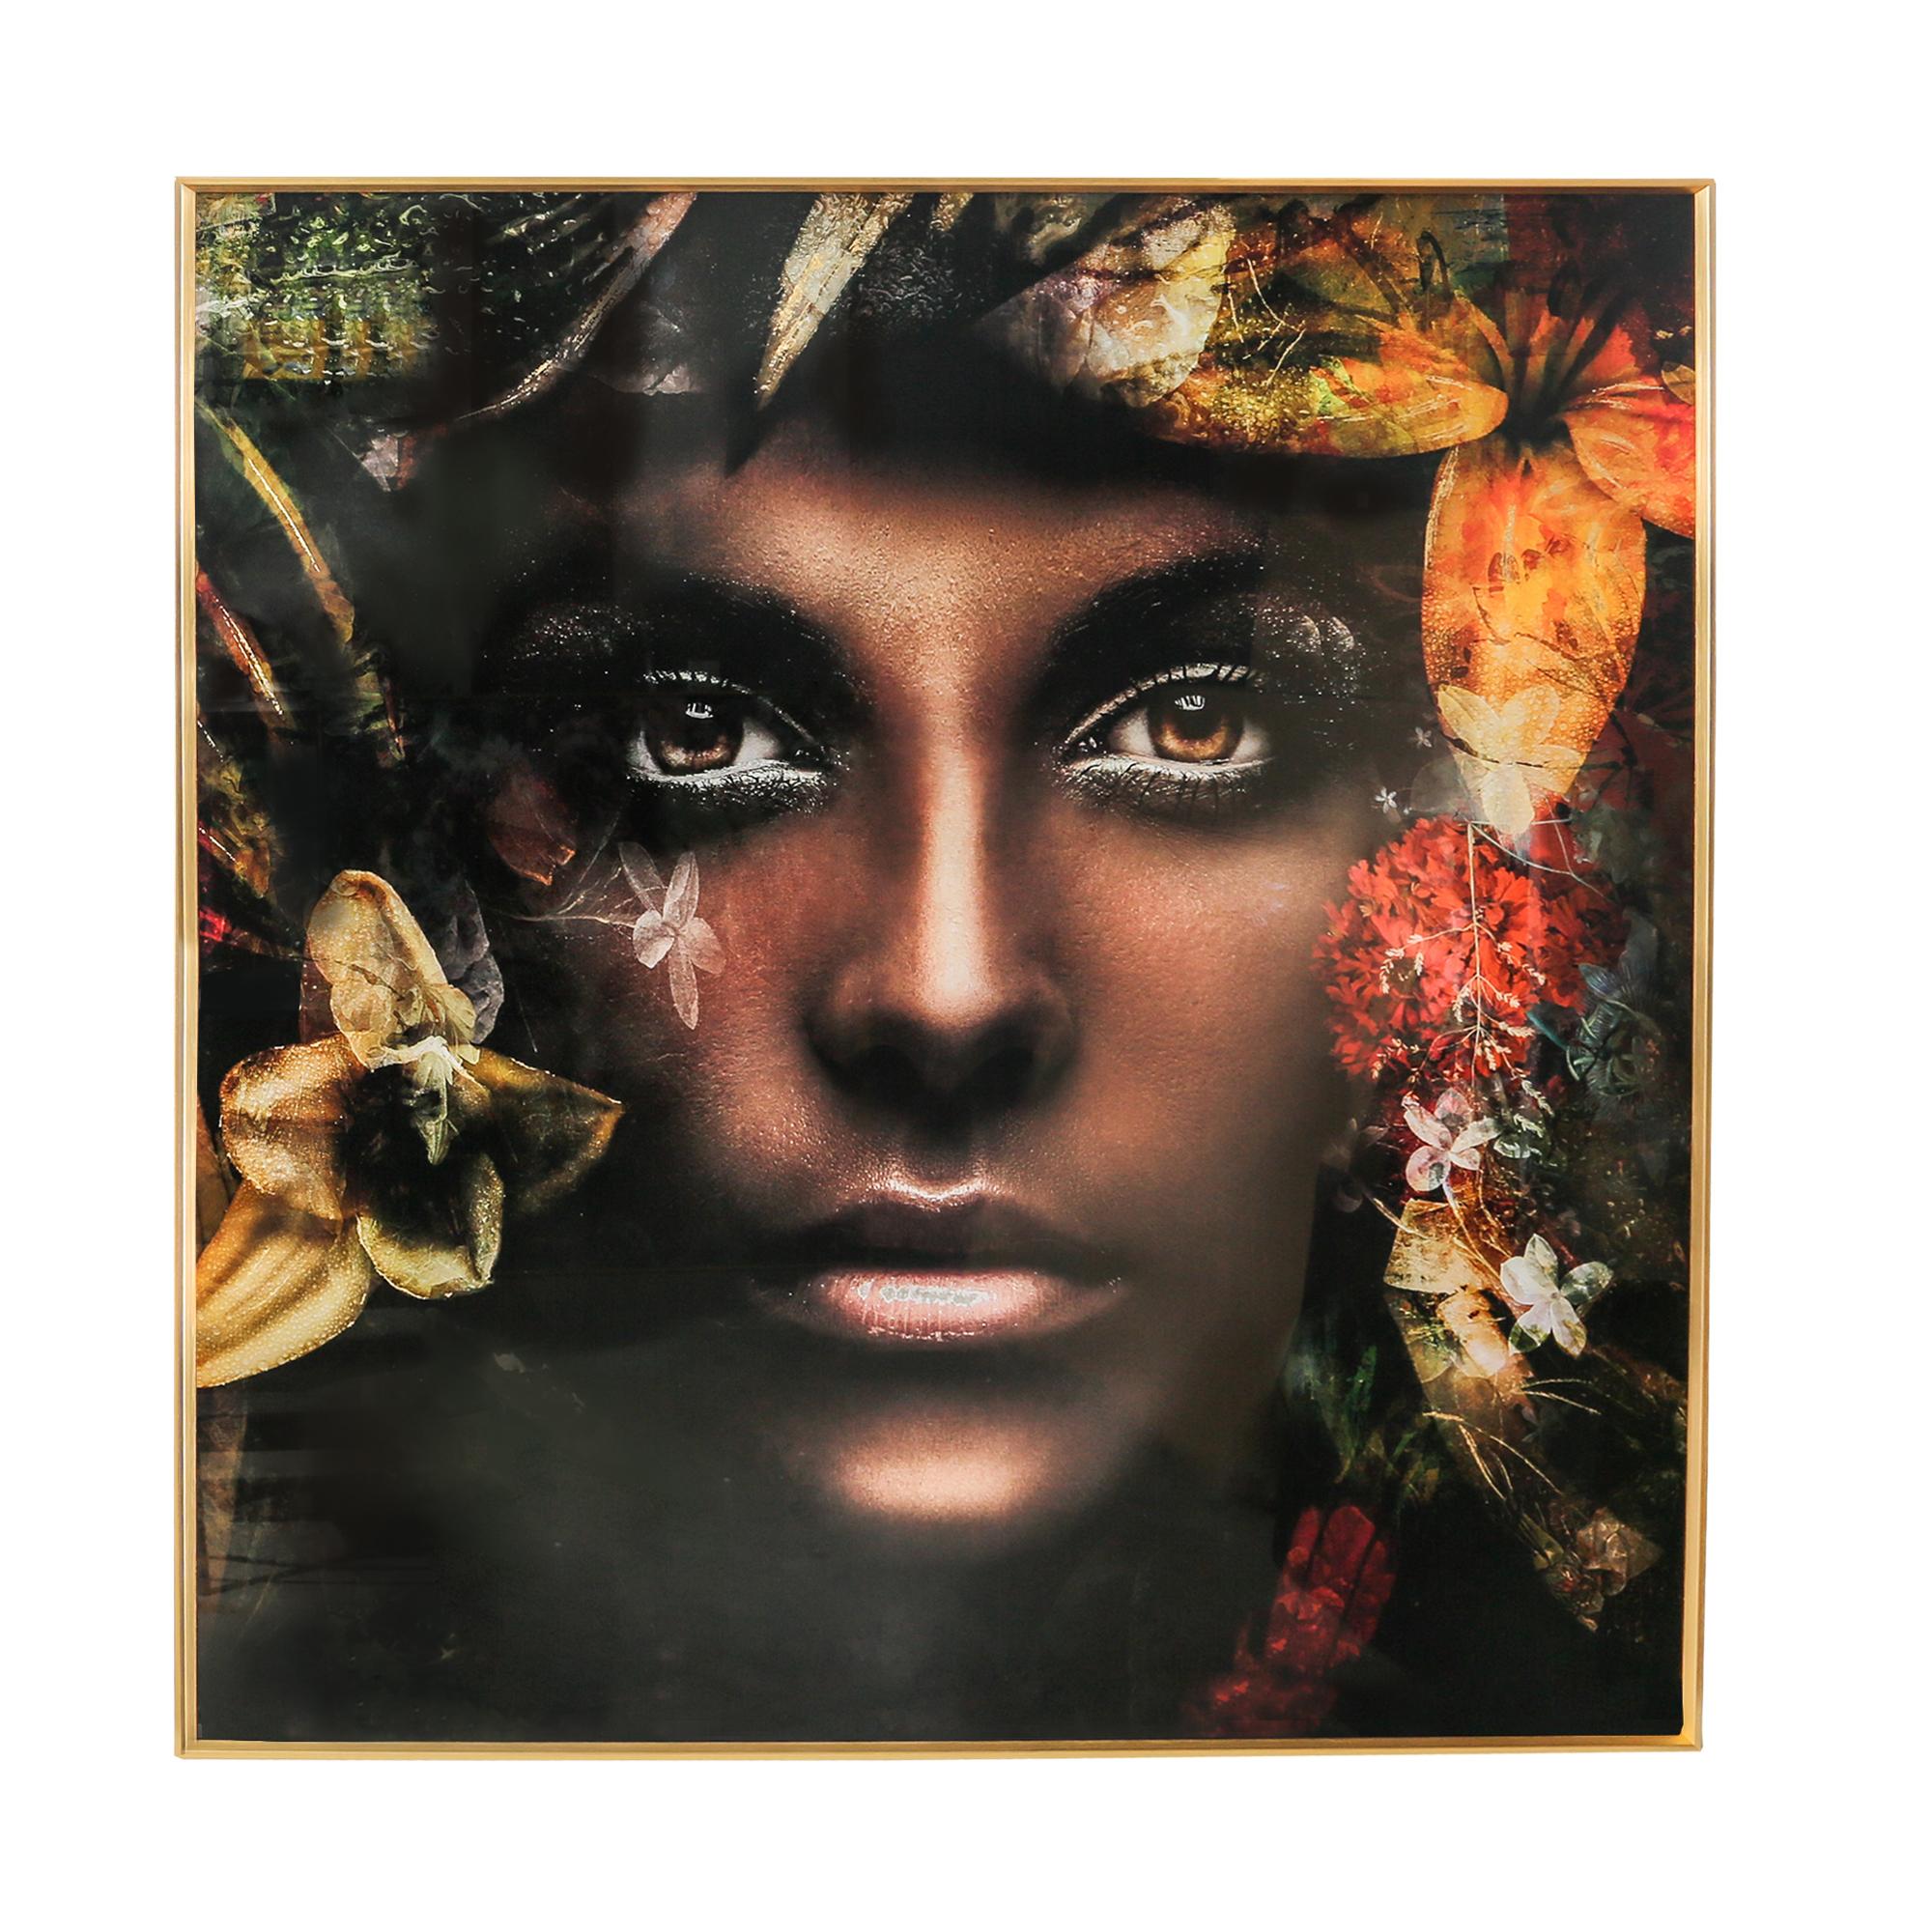 Wandbild Glass Frau nature